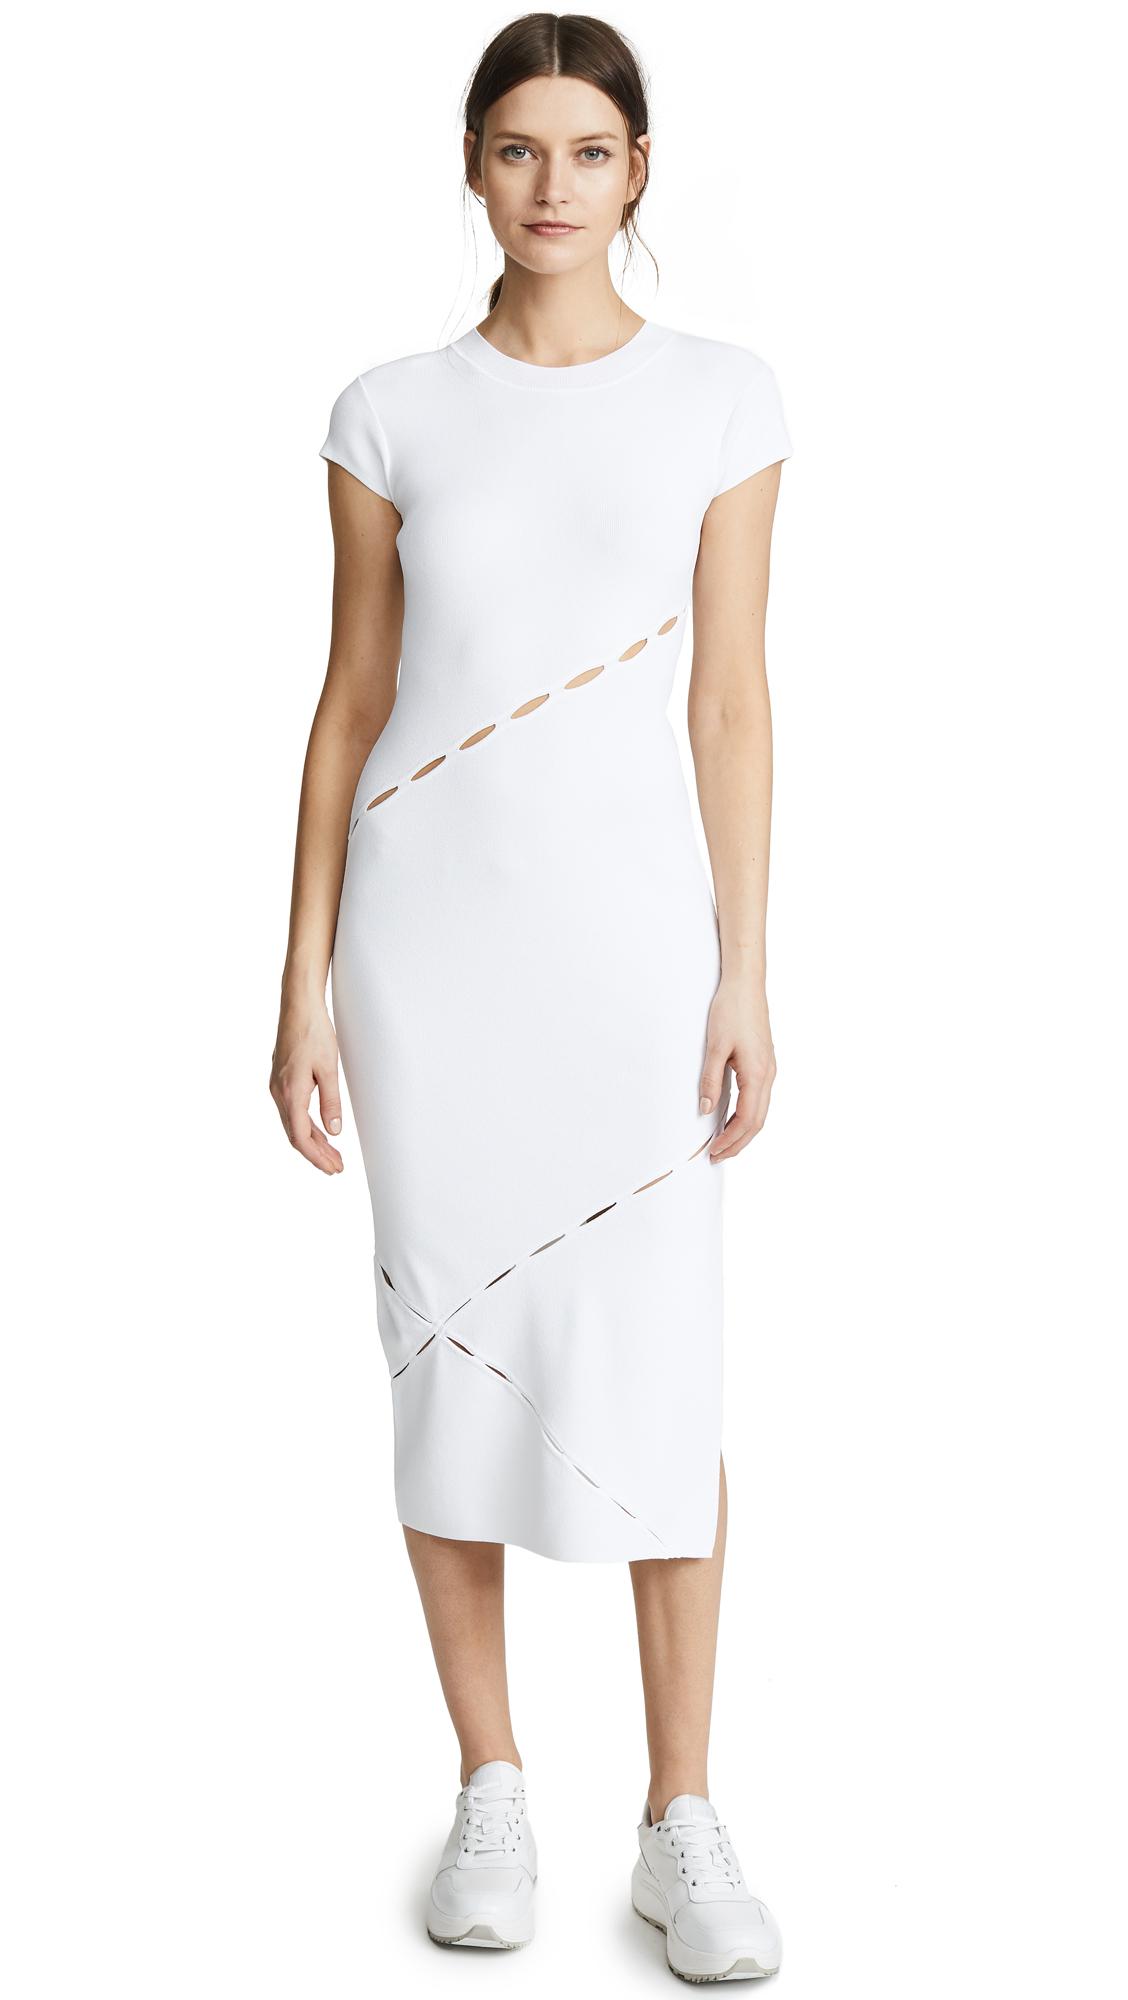 Rag & Bone Eden Dress In White